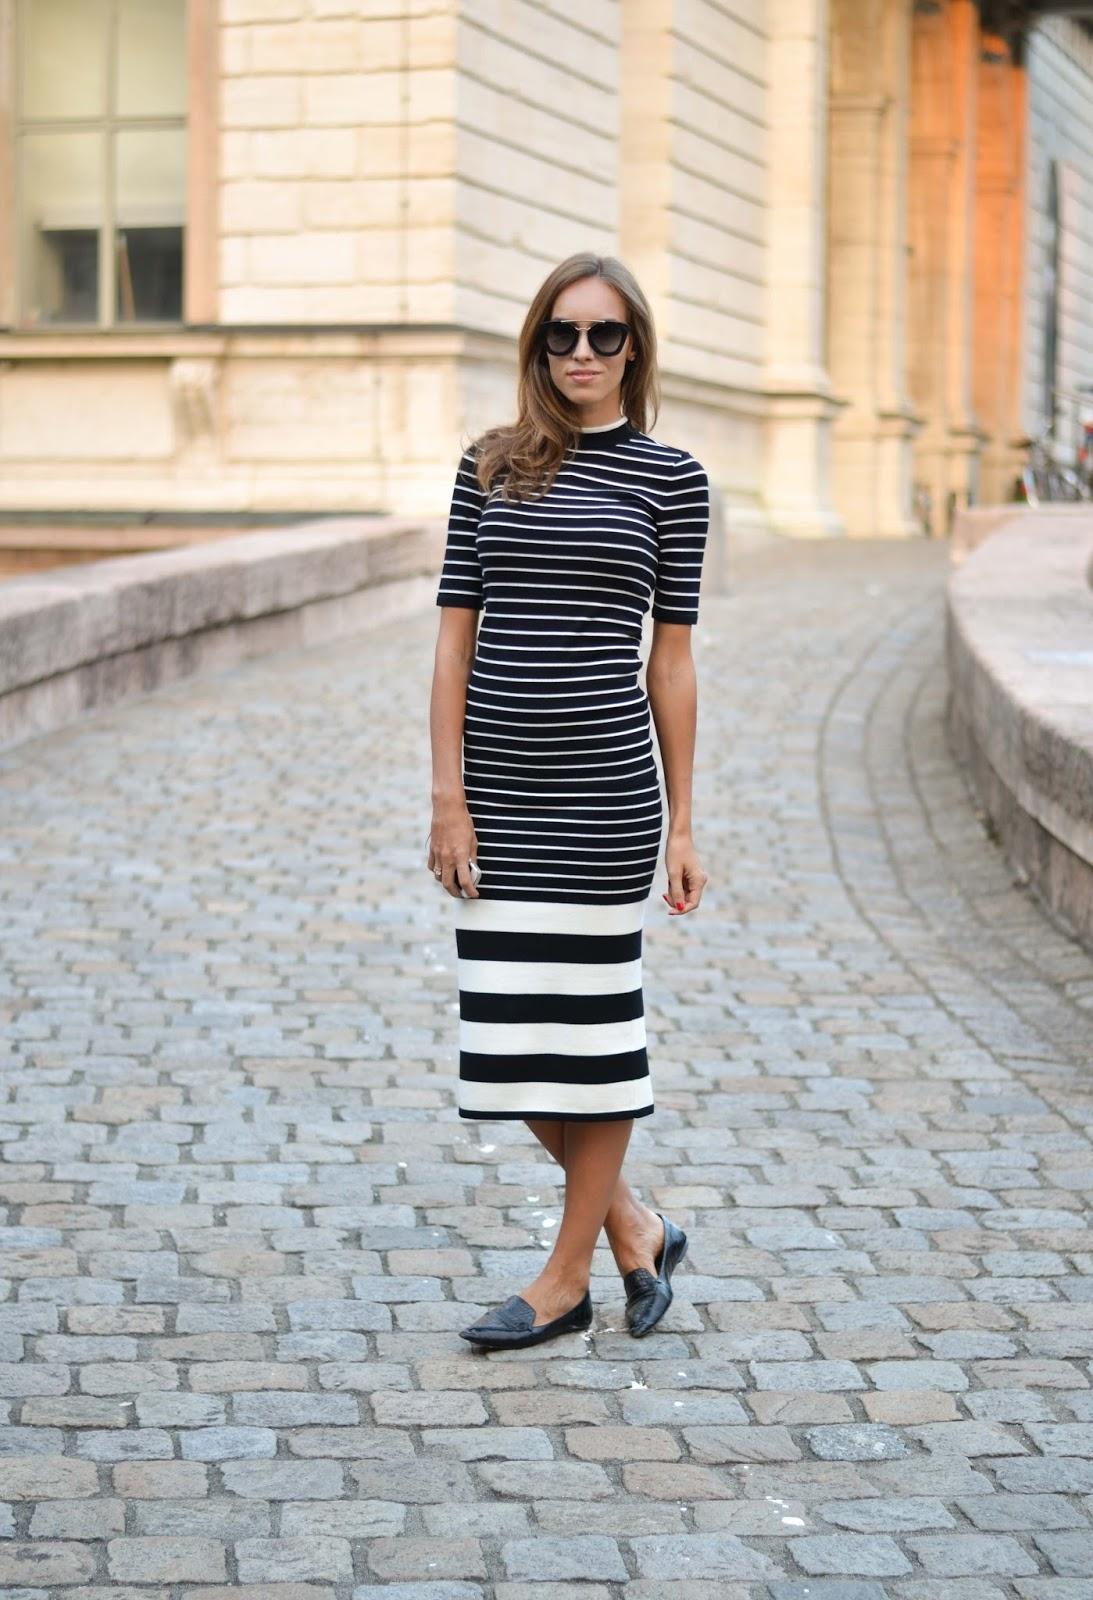 kristjaana mere hm striped knitted set